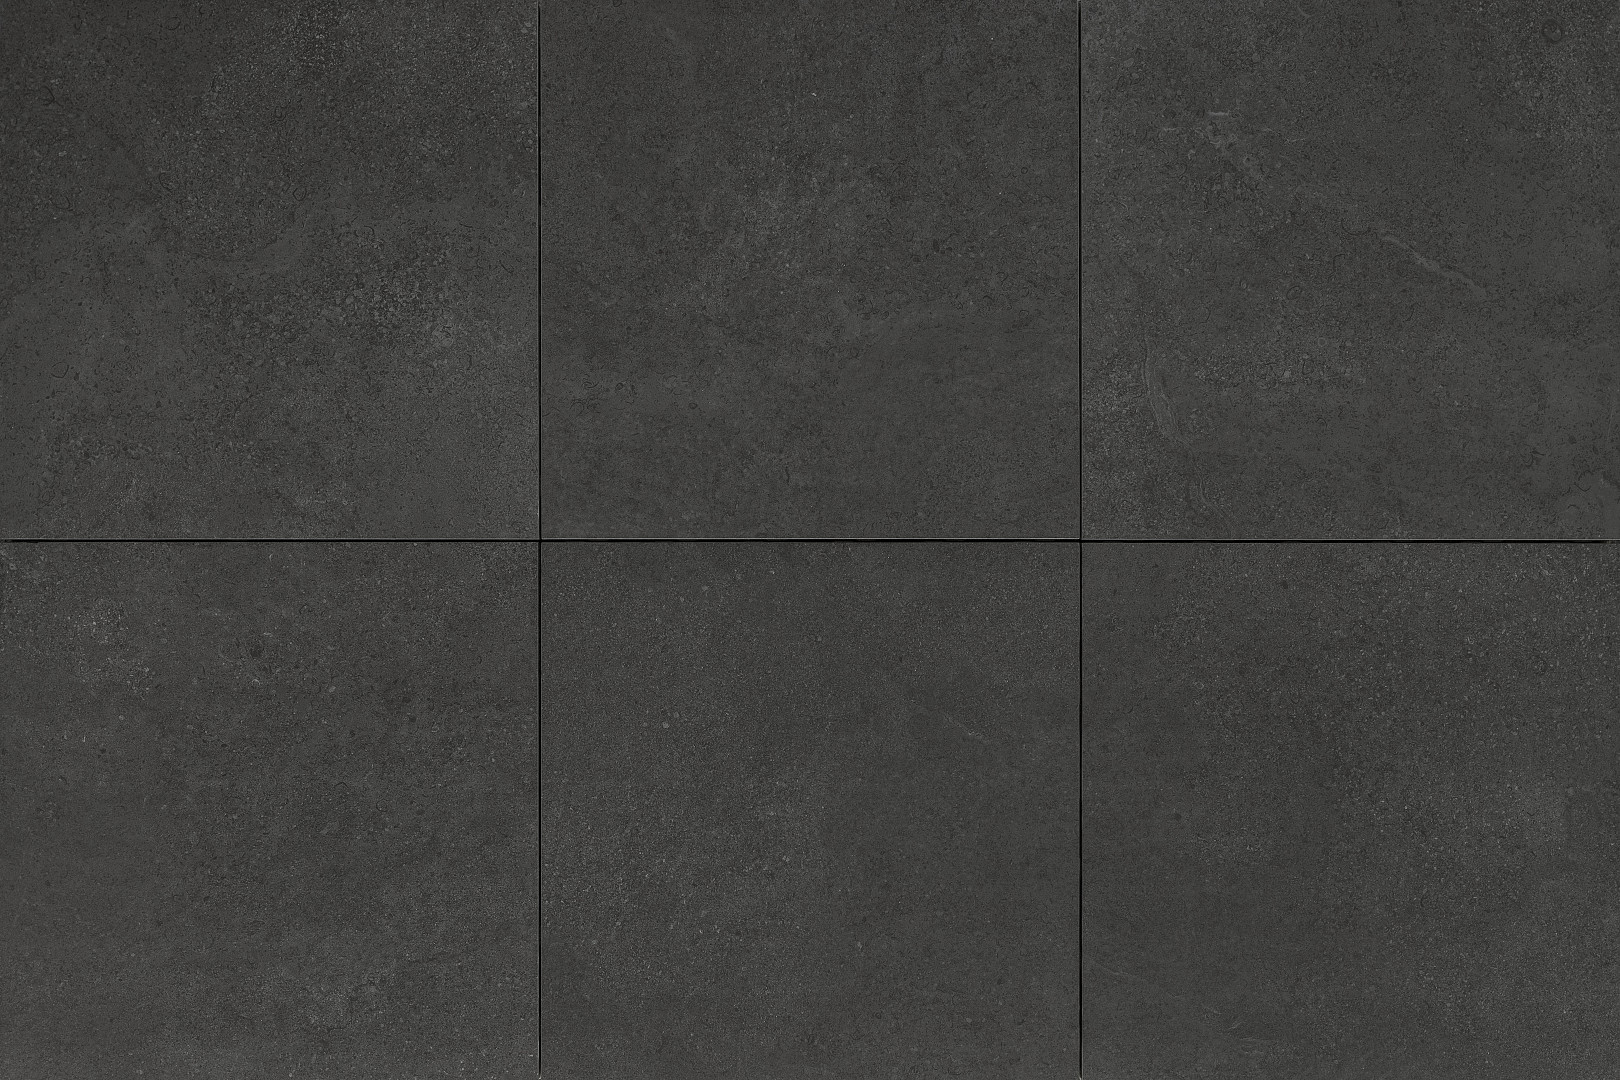 CERASUN Reefstone Black 60x60x4